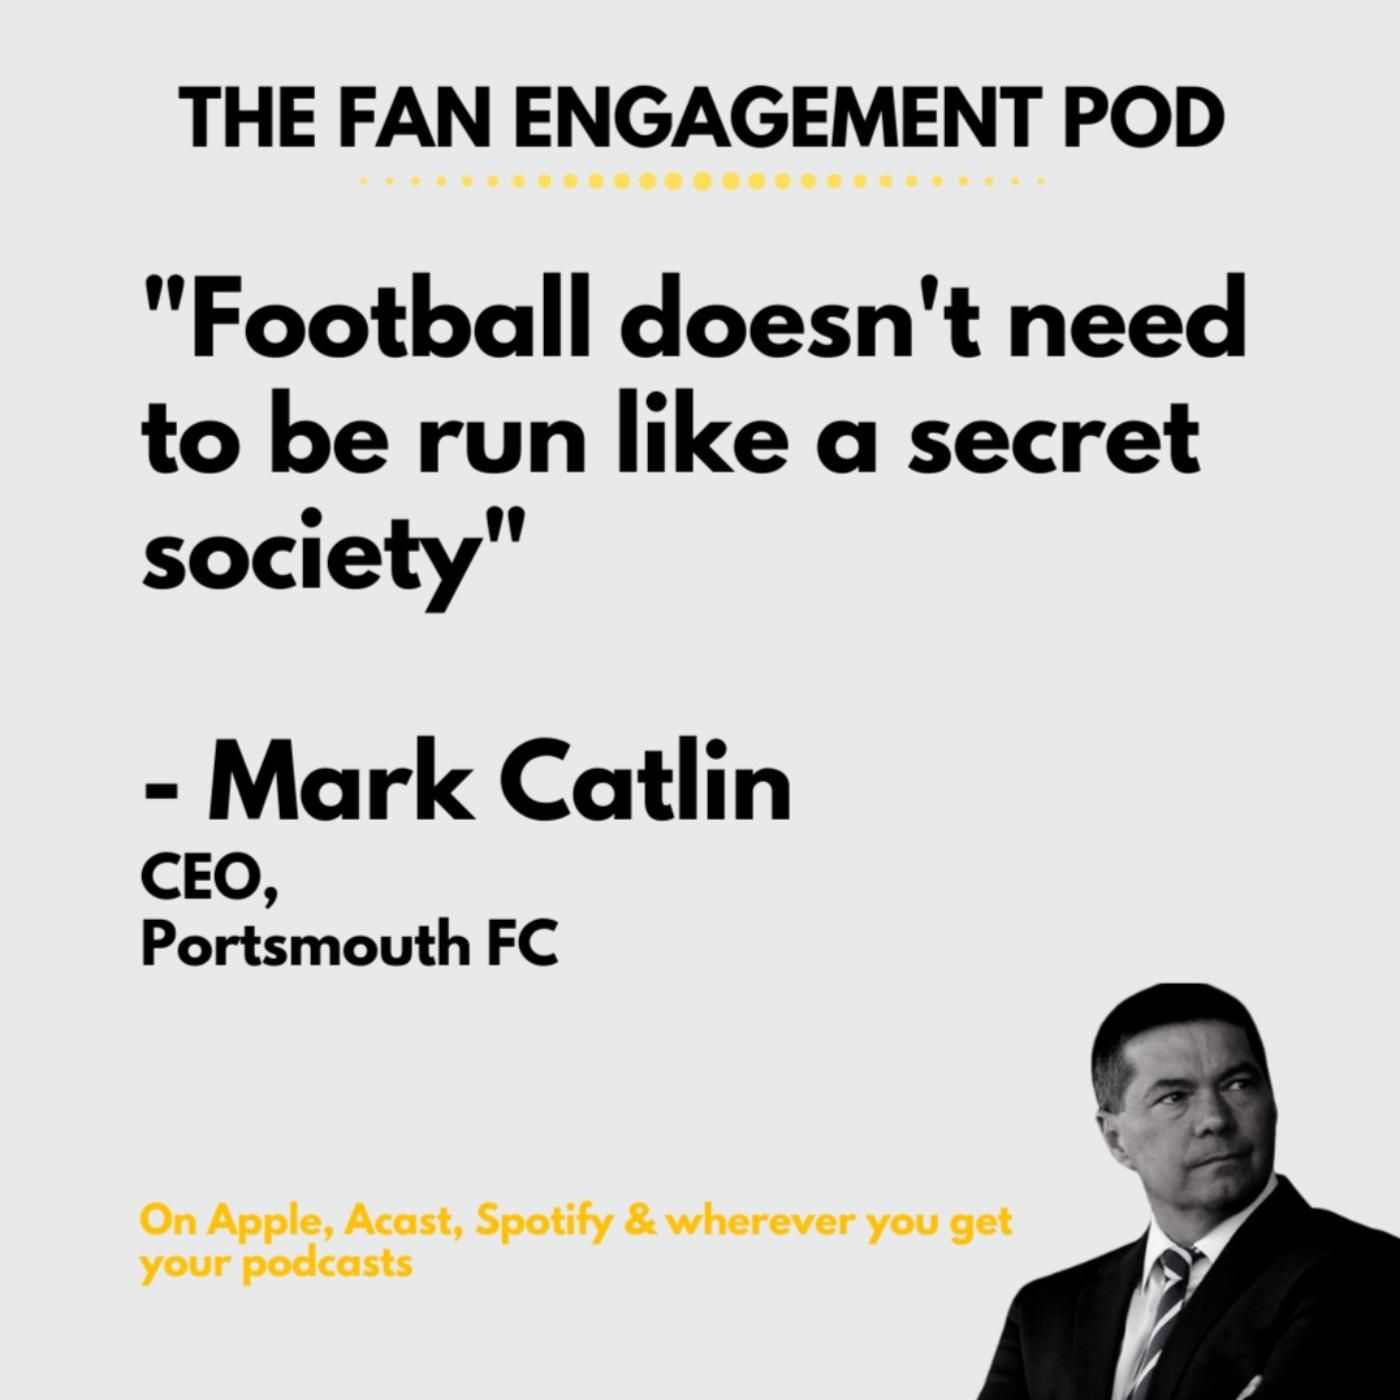 Portsmouth's Mark Catlin: Football isn't a secret society